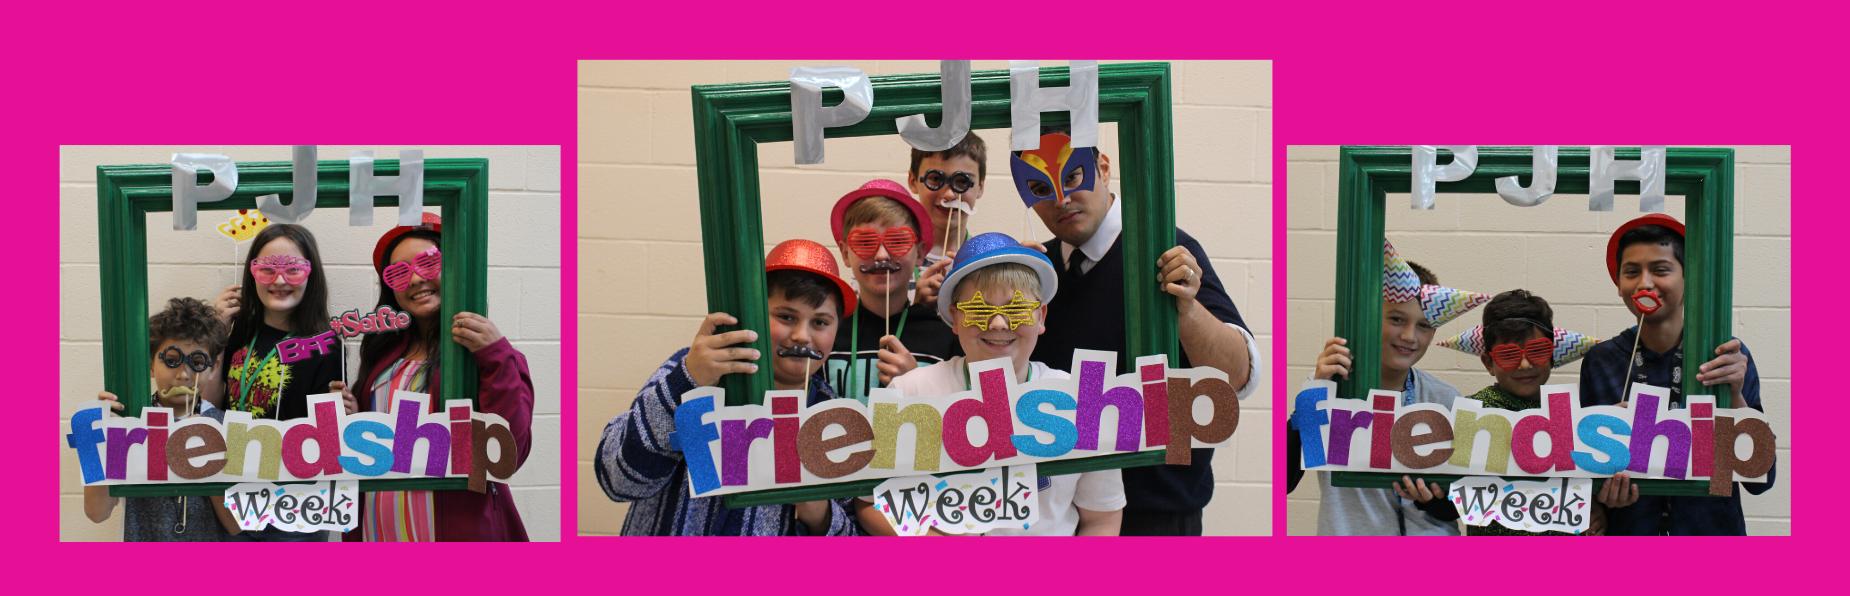 6th grade friendship day